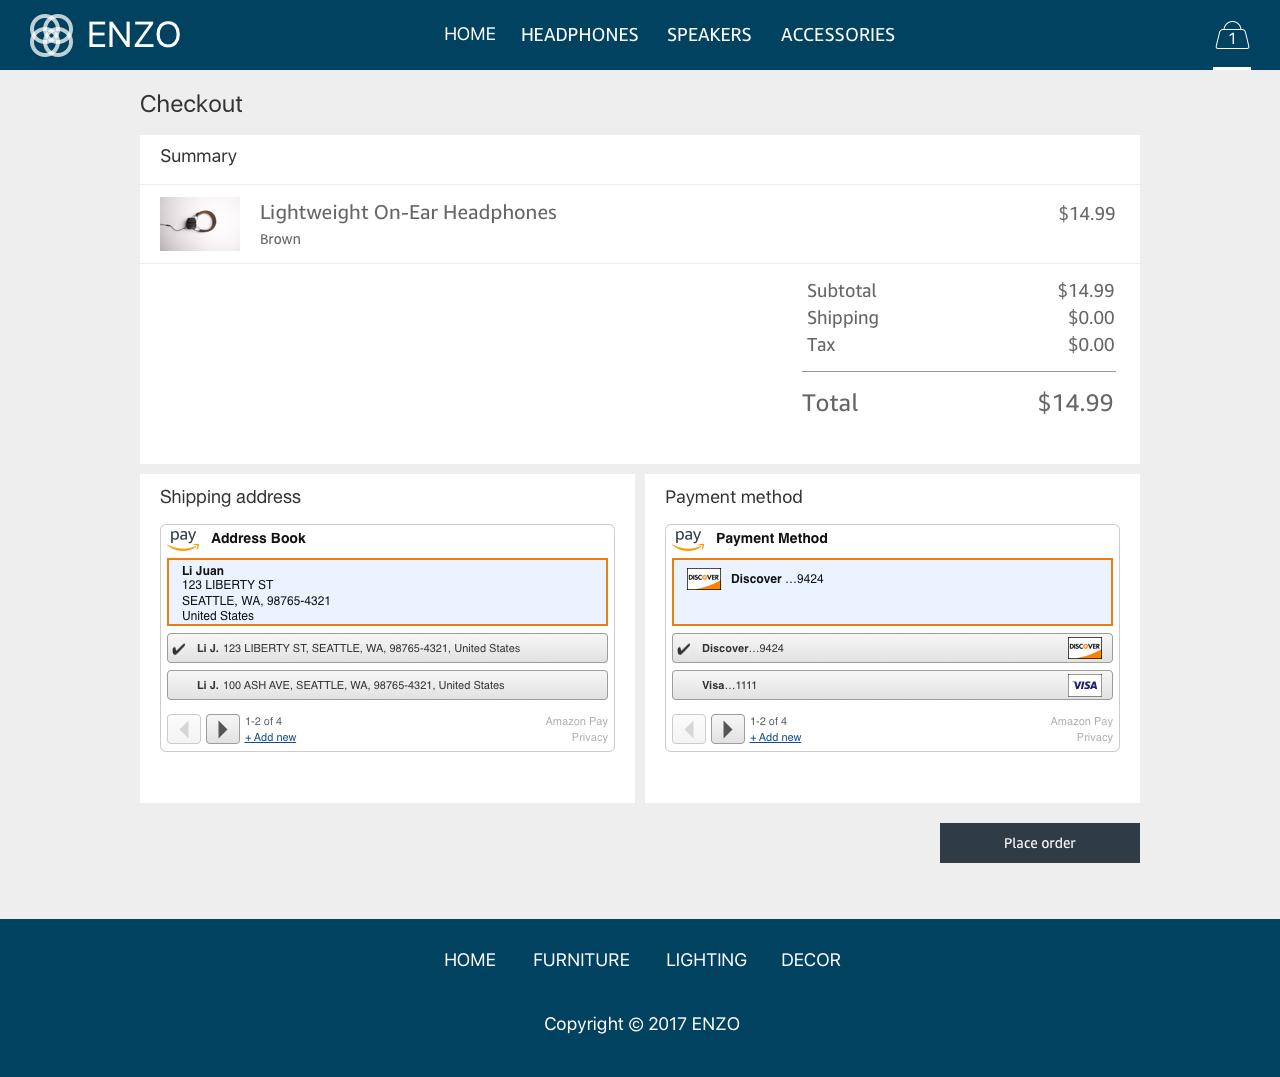 Amazon Pay Demo - #5 - Checkout